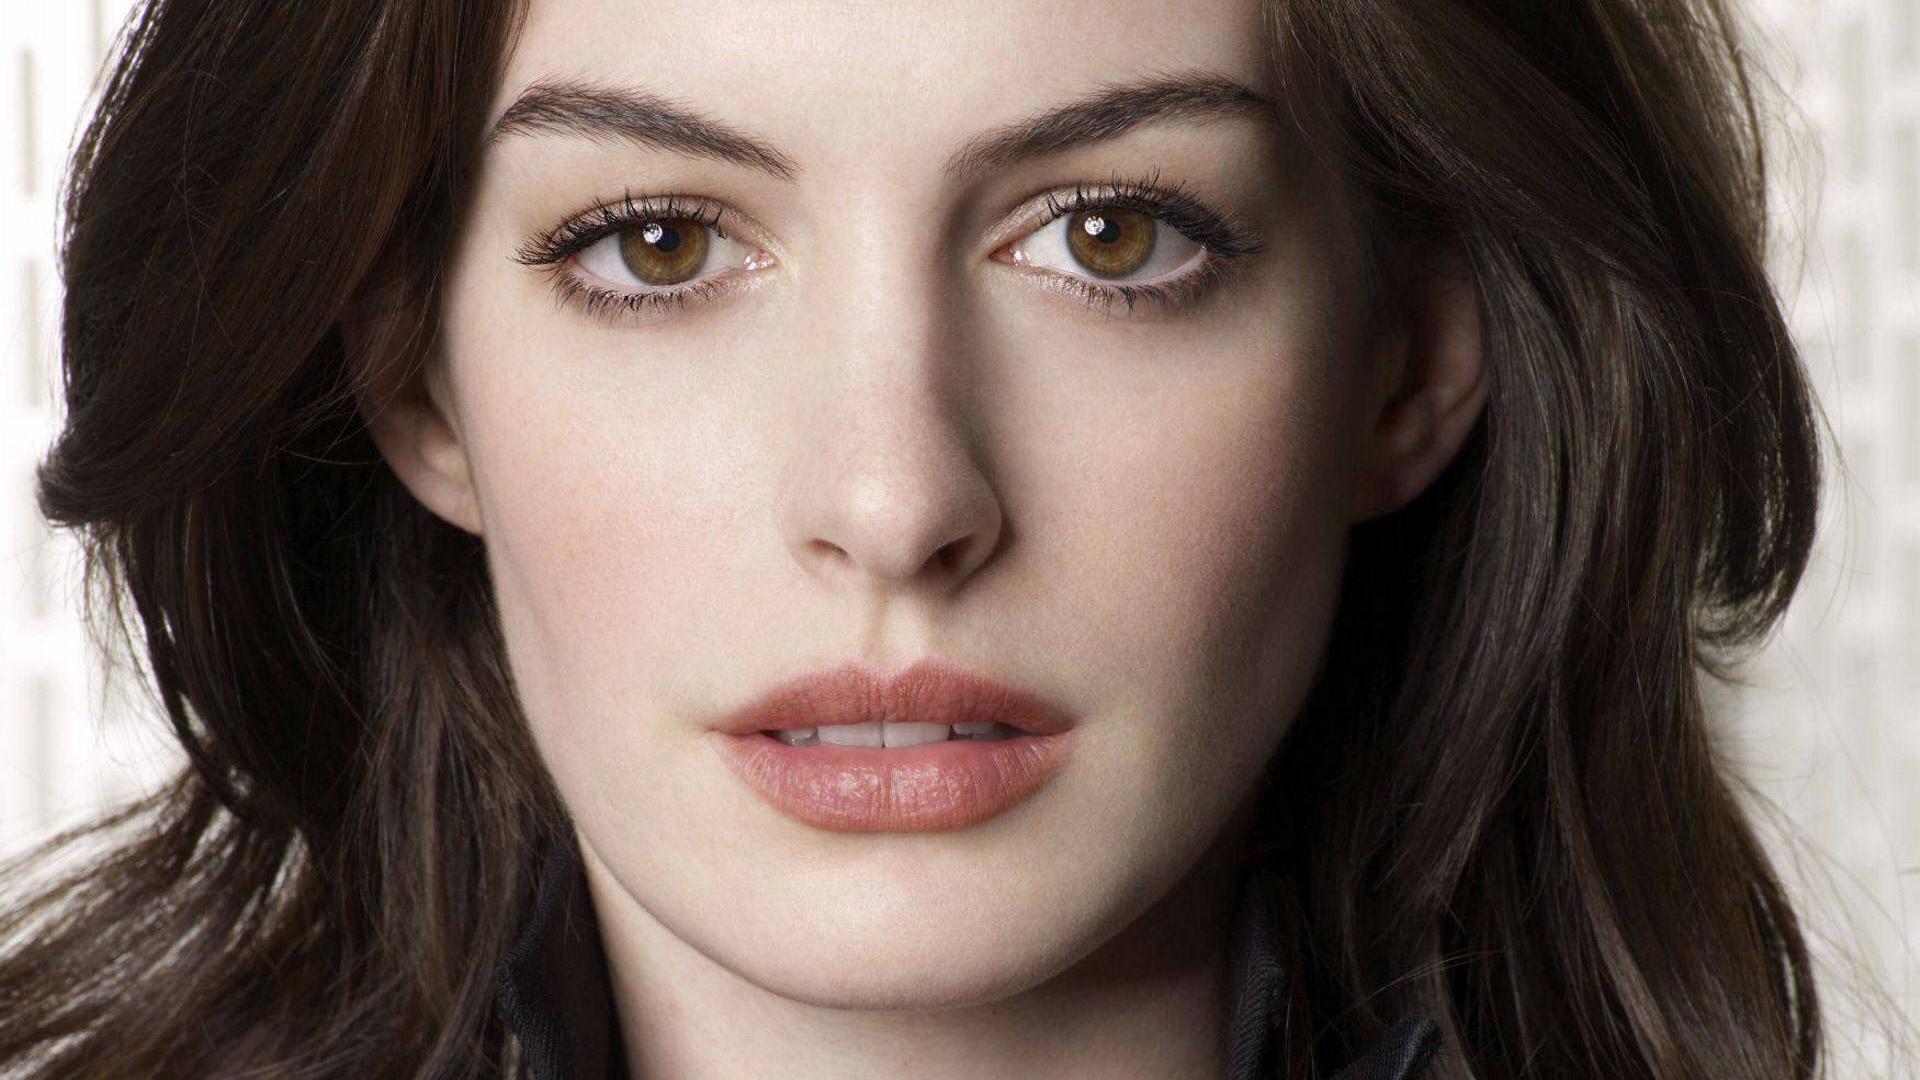 Anne Hathaway Face Hd